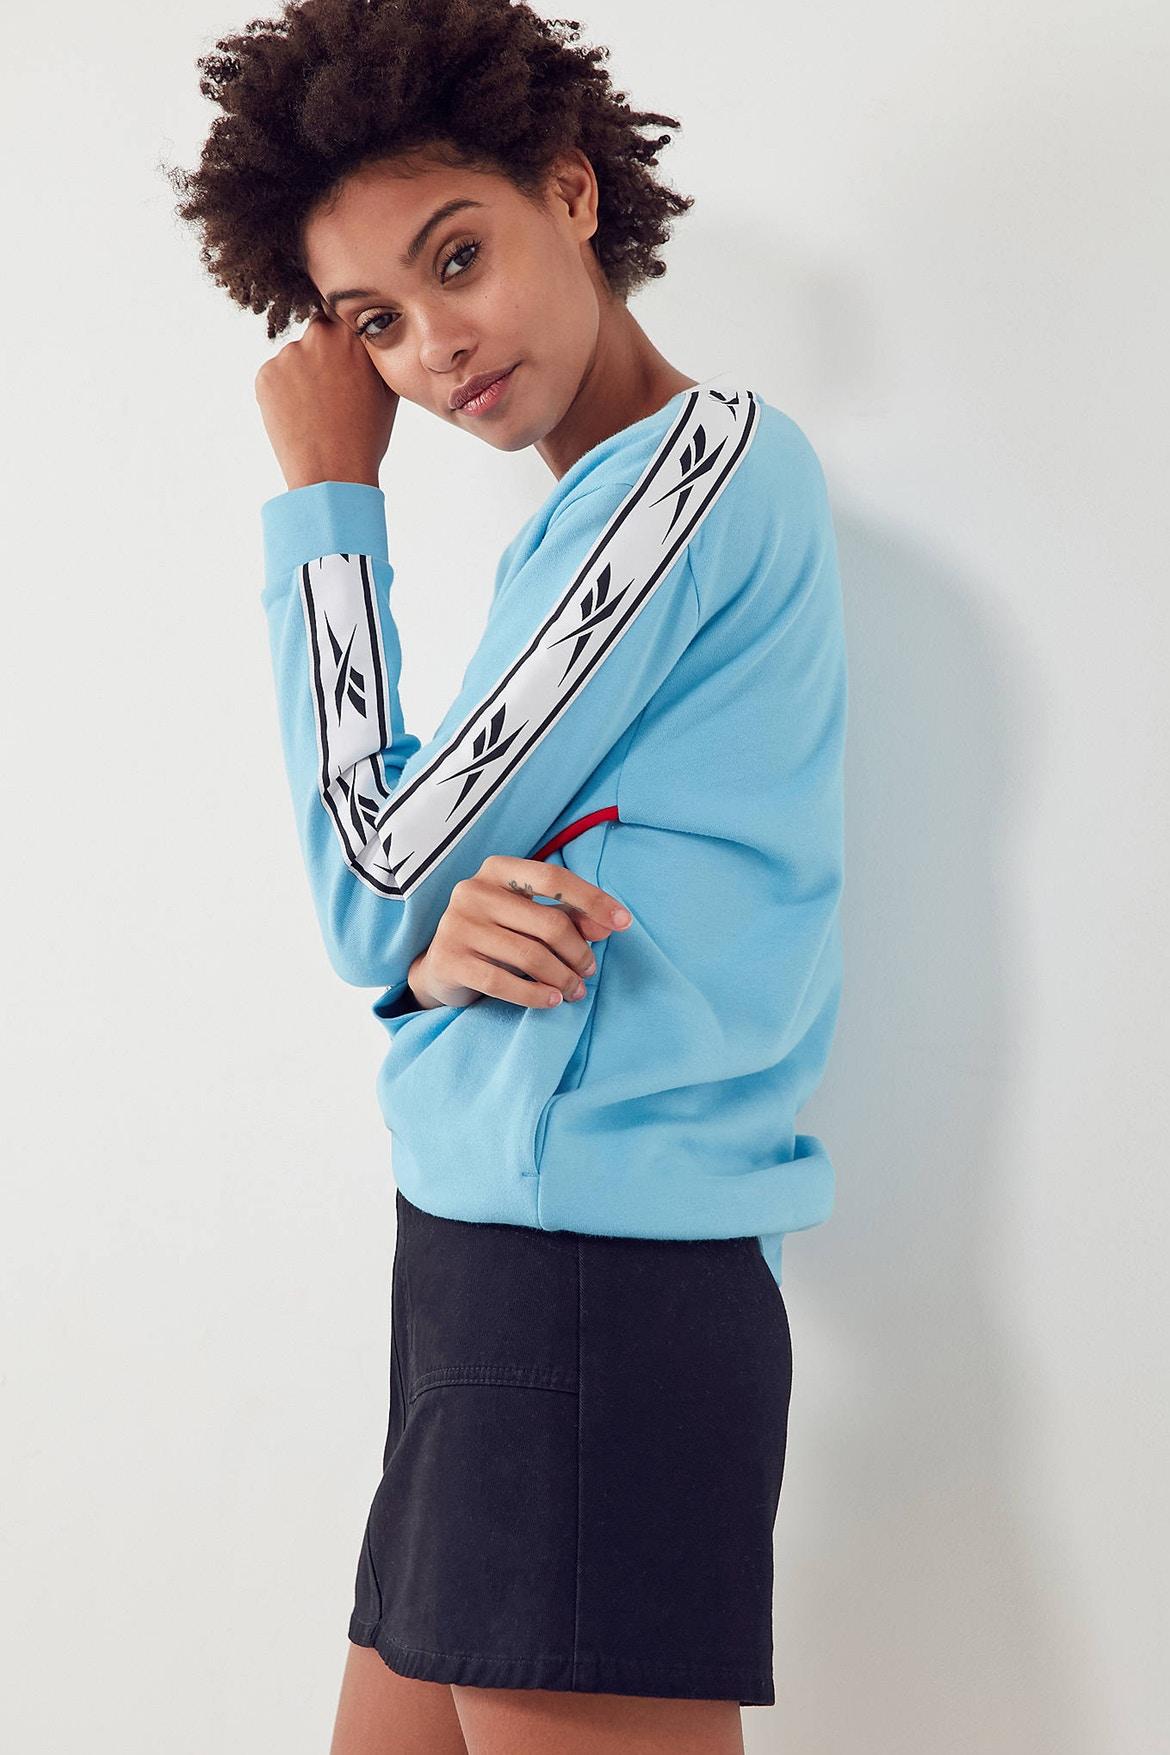 http-bae.hypebeast.comfiles201707reebok-urban-outfitters-vector-sweatshirt-blue-1